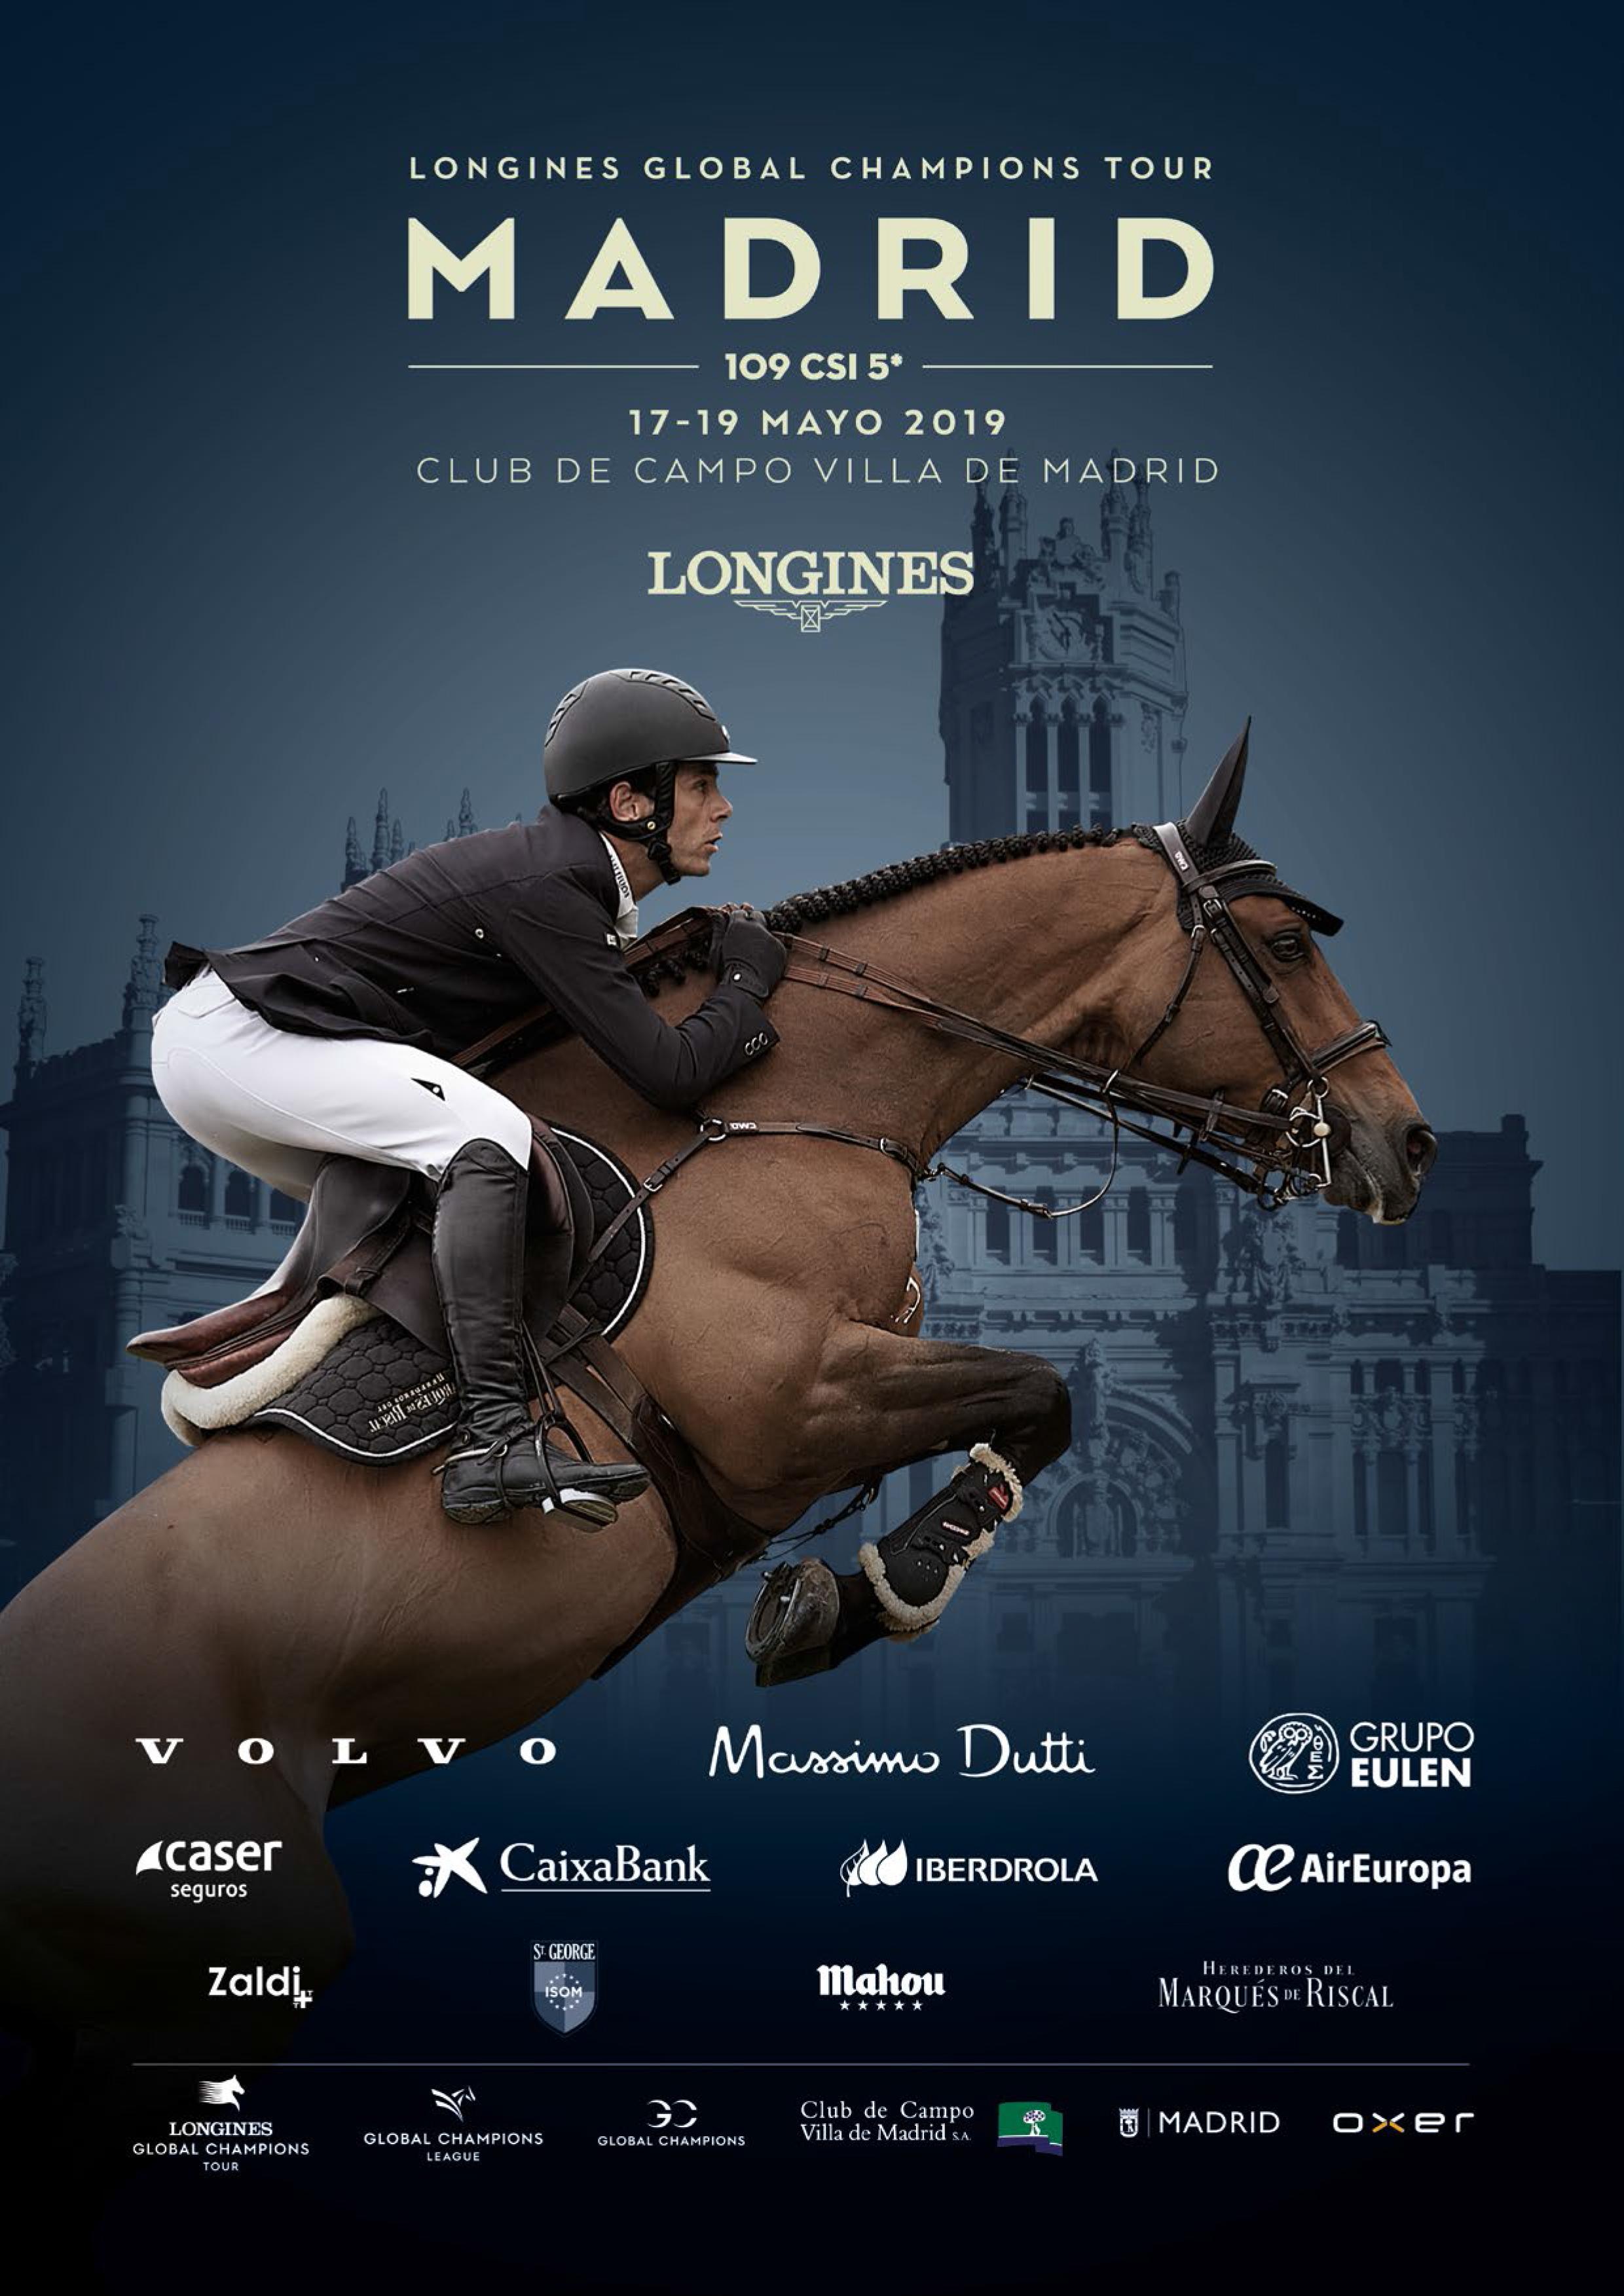 Cartel del CSI Madrid 5*-Longines Global Champions Tour 2019